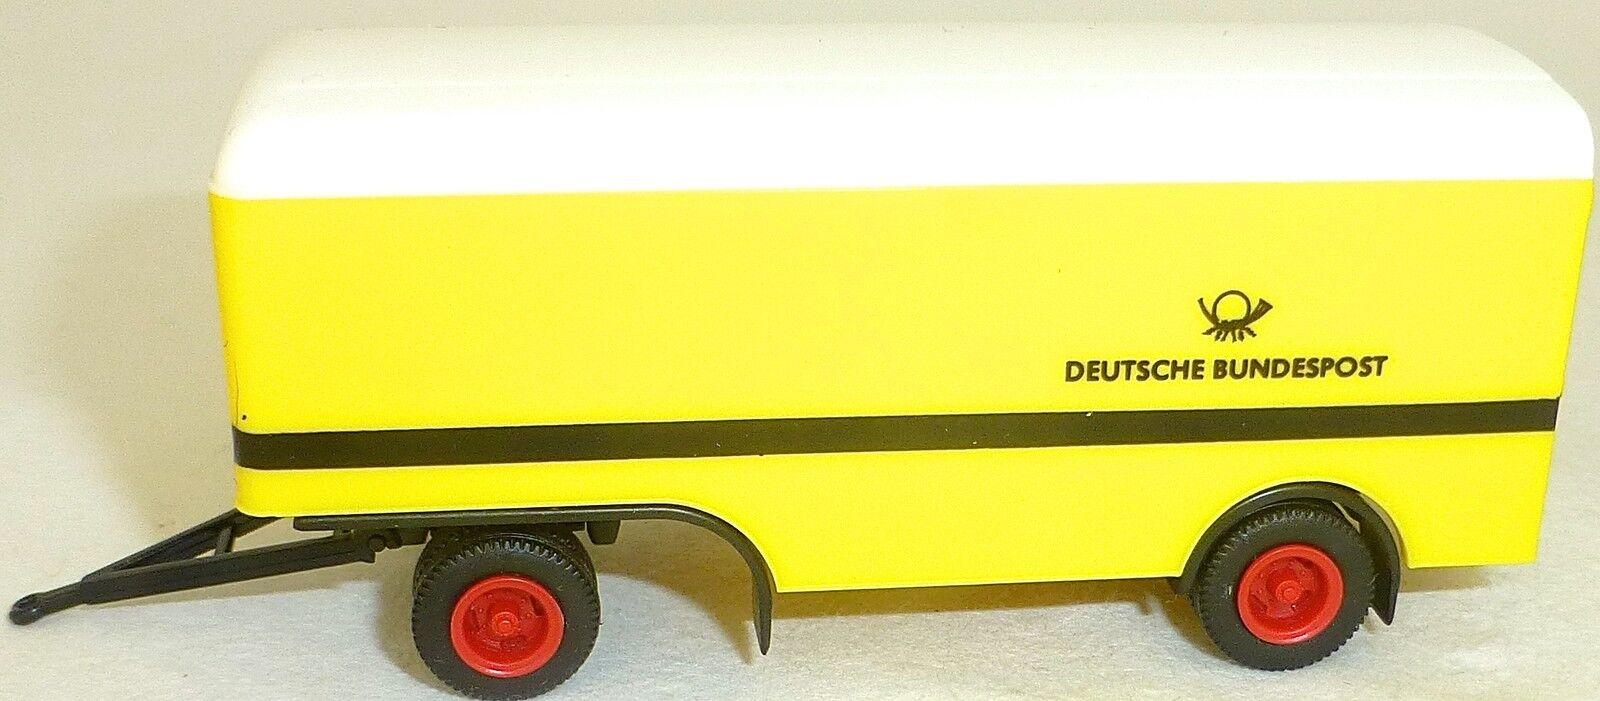 Deutsche Bundesport Camion   Remorque Remorque Remorque Années 1960 H0 1 87 sans Emballage Å 5248ee